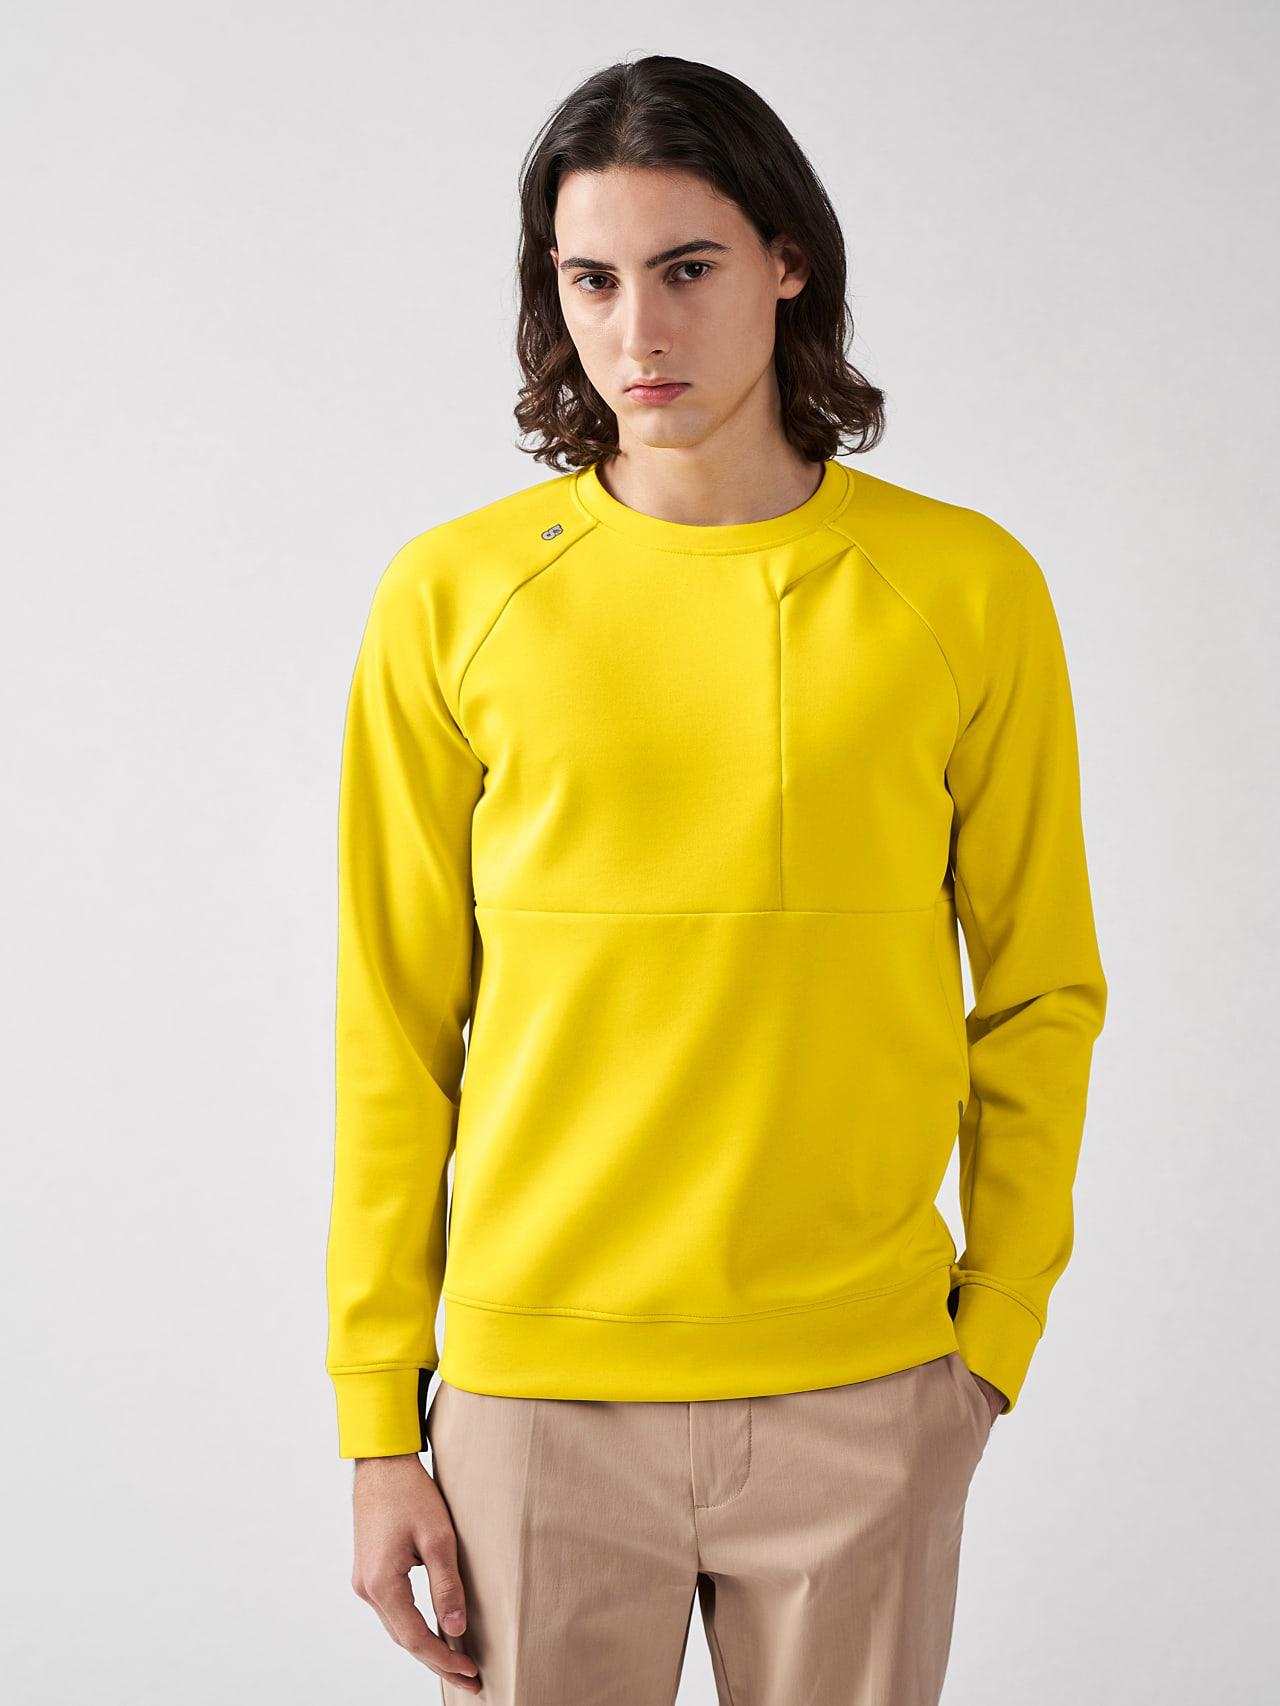 SUPRA V3.Y5.01 Technical Crewneck Sweater yellow Model shot Alpha Tauri